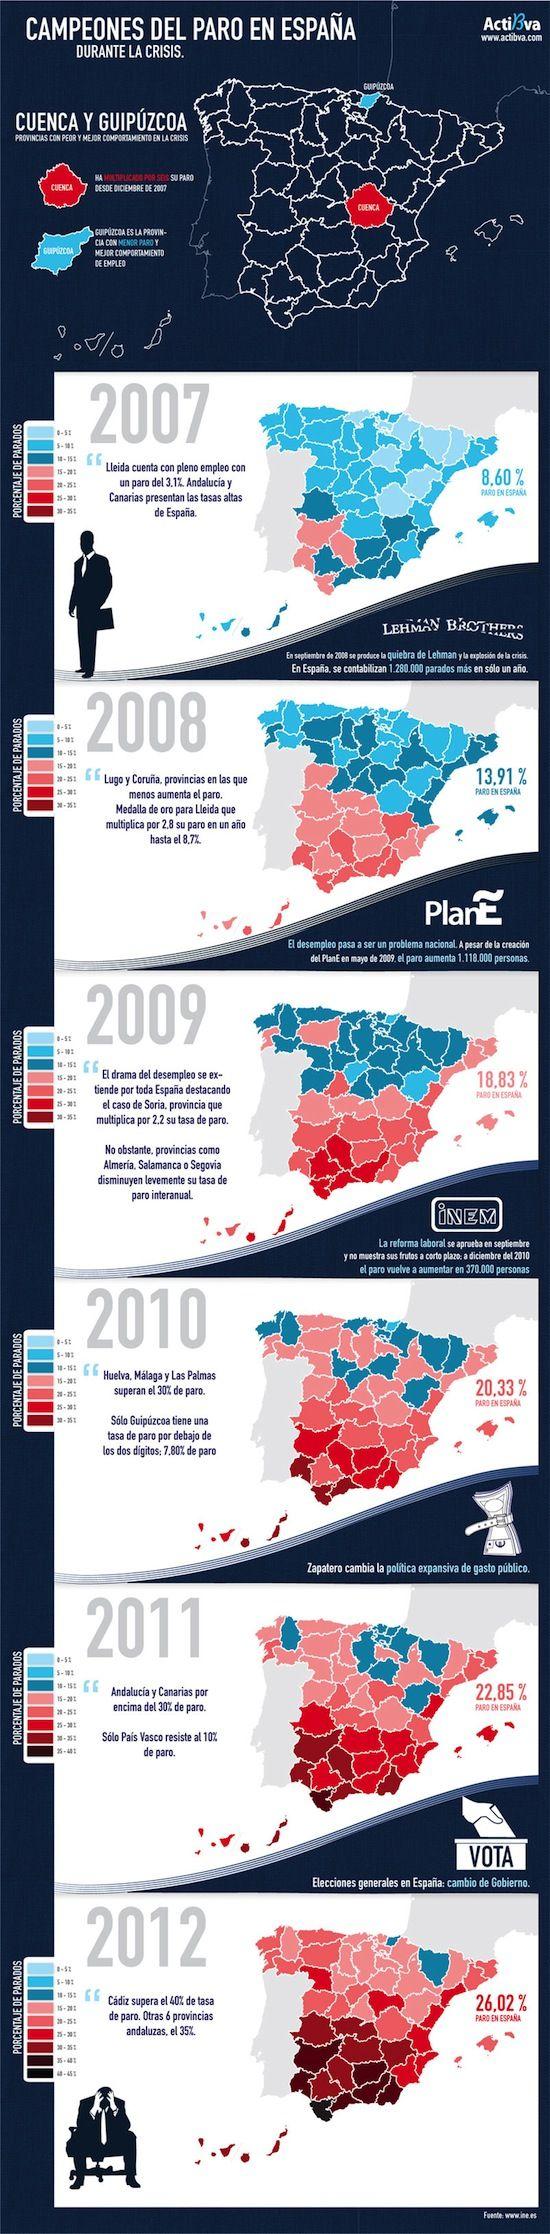 Evolucion del paro en España 2007-2012